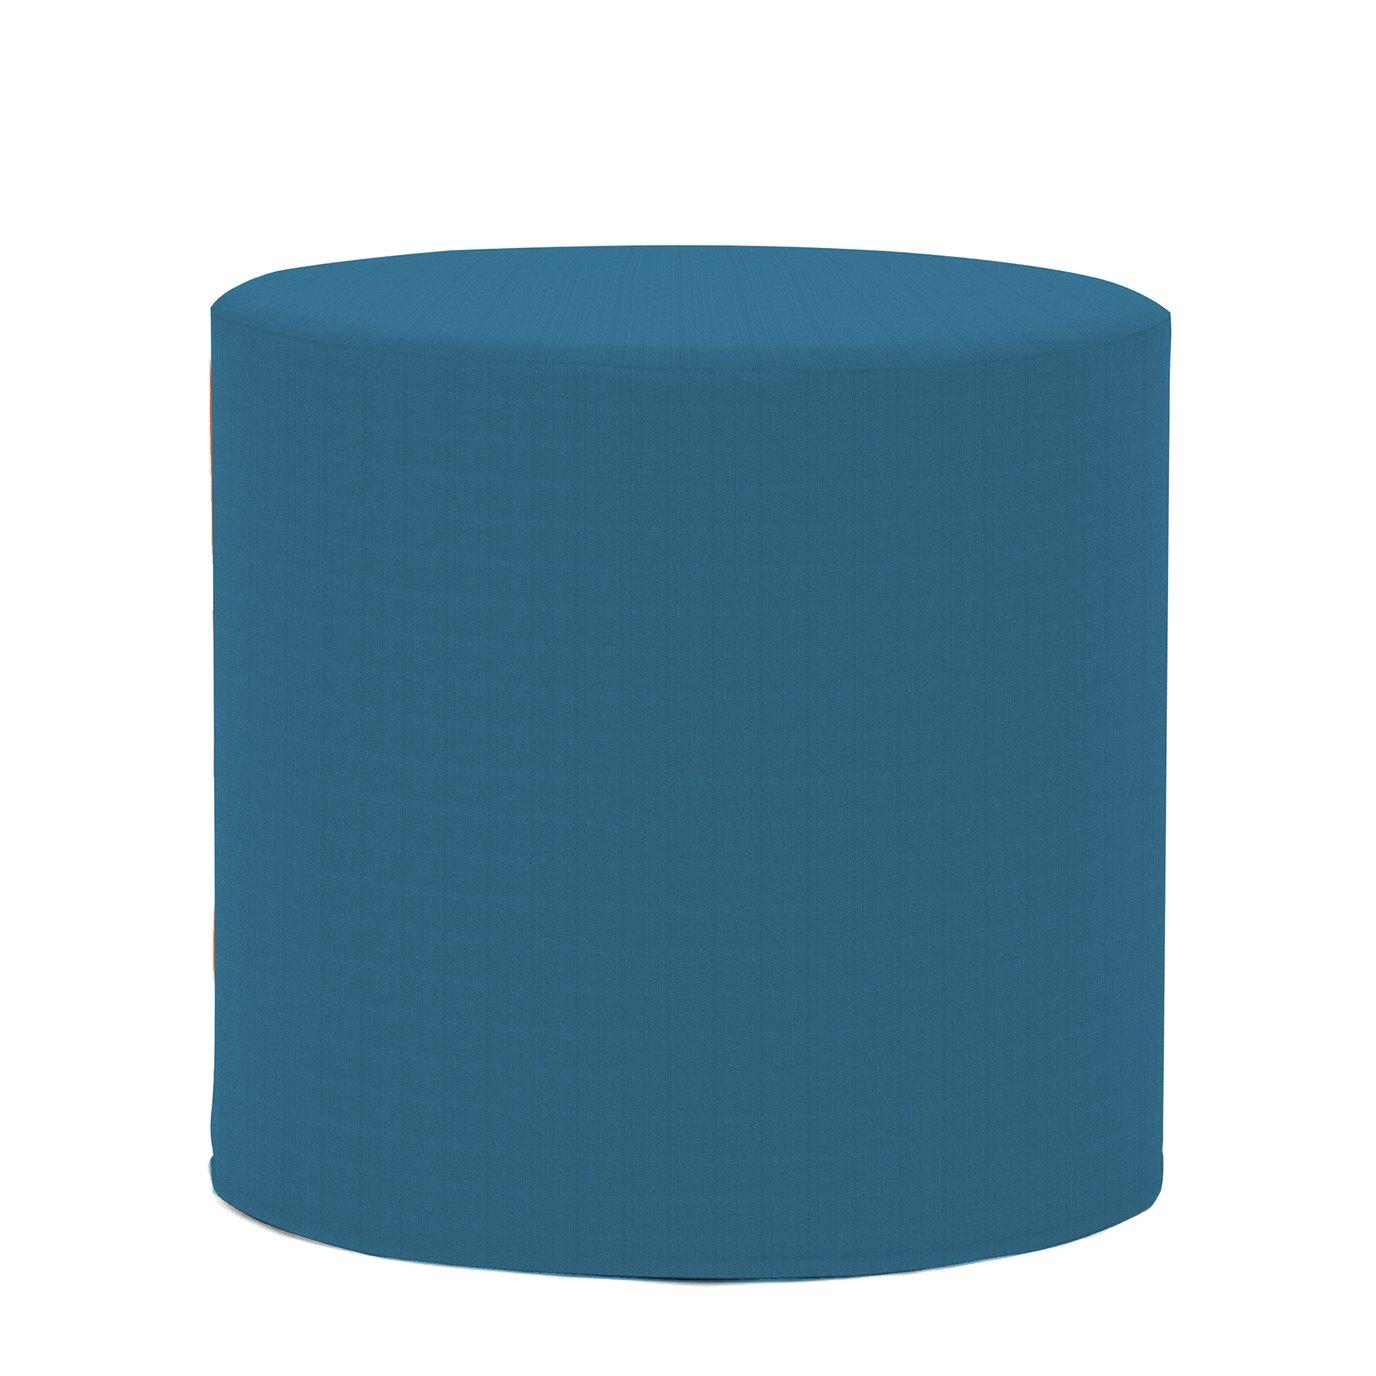 Howard Elliott No Tip Cylinder Seascape Turquoise